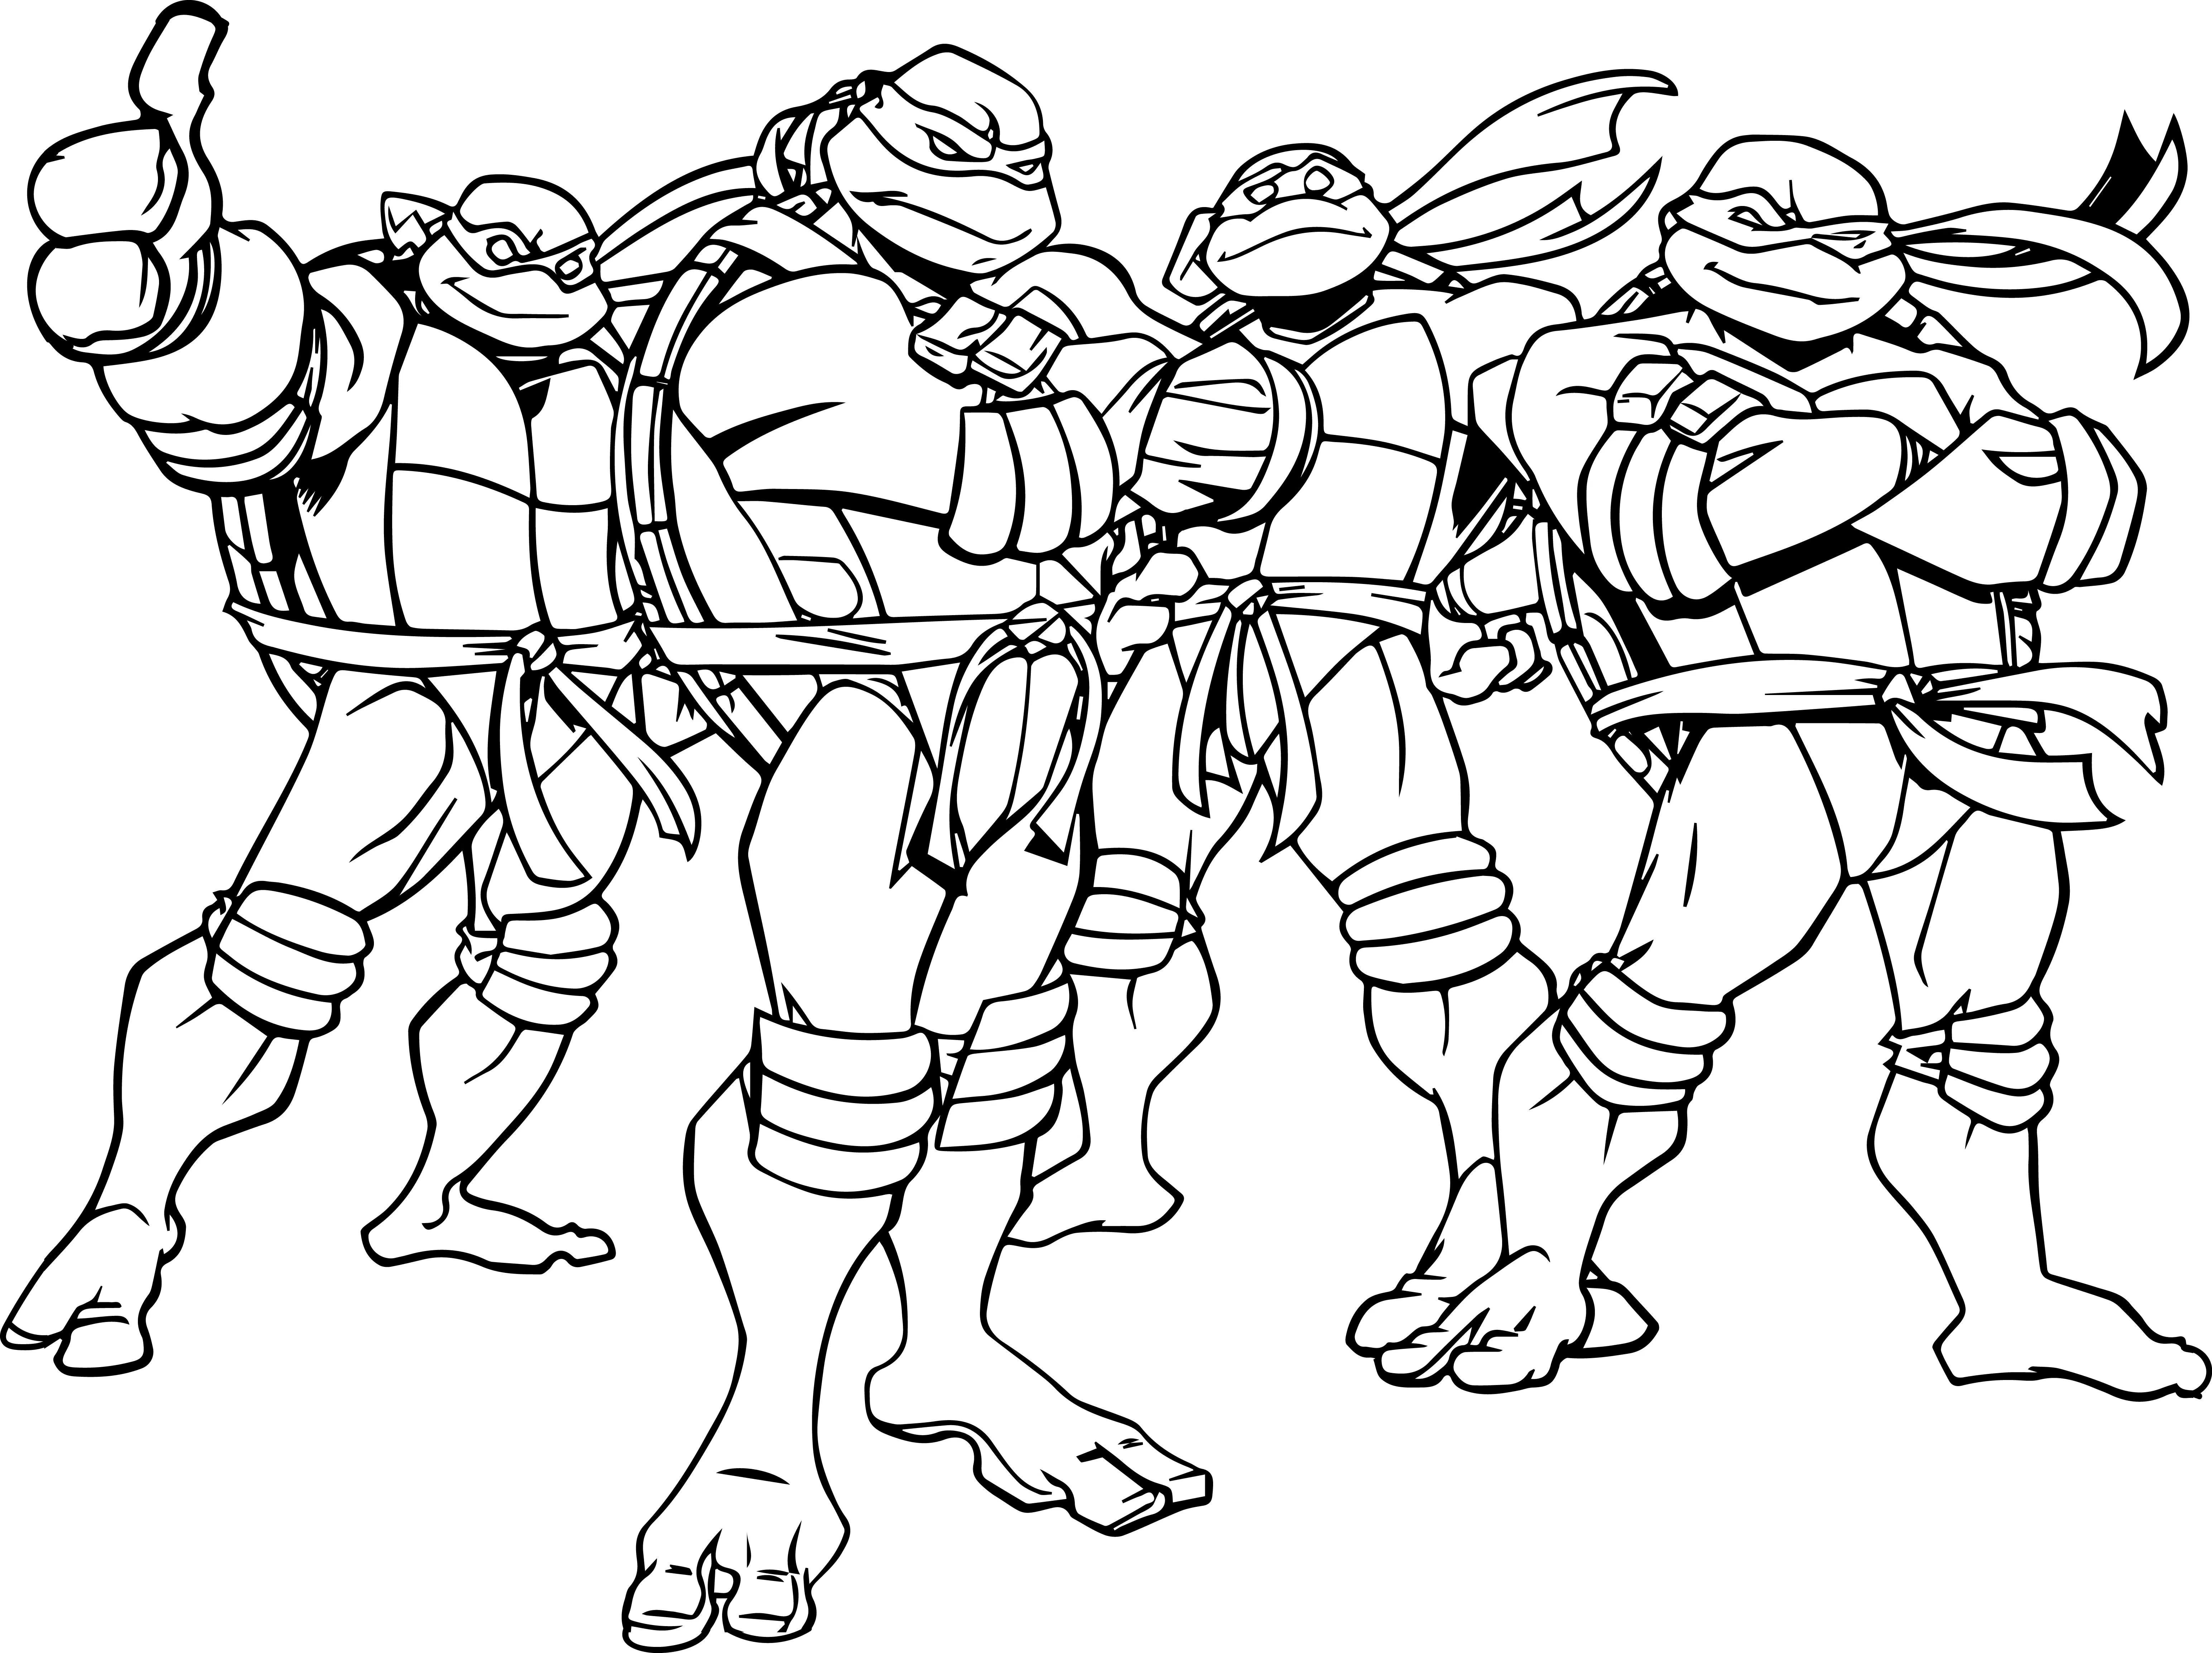 6176x4614 New Teenage Mutant Ninja Turtles Coloring Pages Bad Guys Design